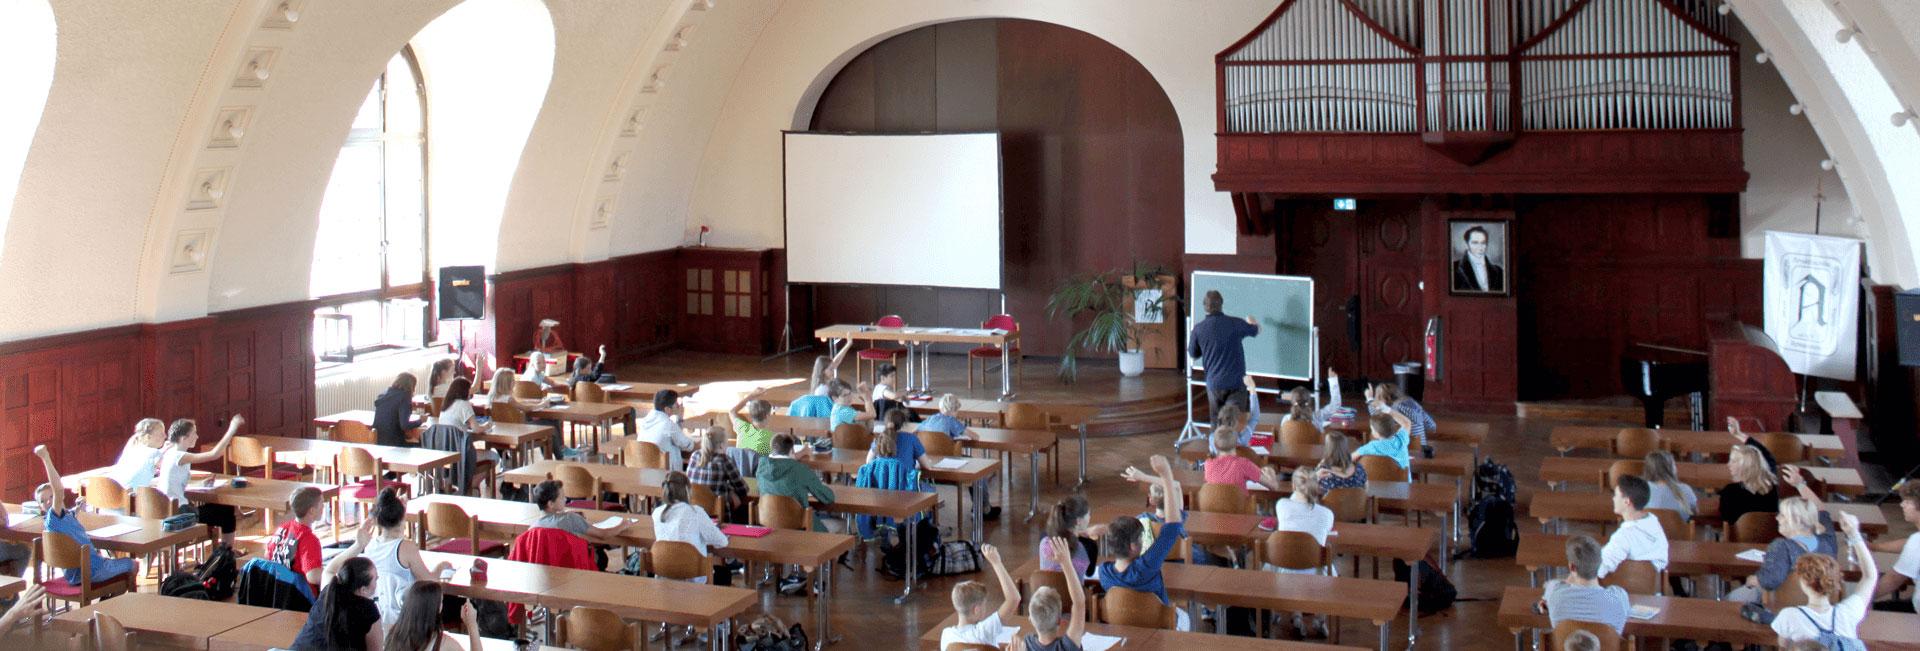 http://www.arnoldi-gym.de/wp-content/uploads/2016/09/aula-header-arnoldi2.jpg